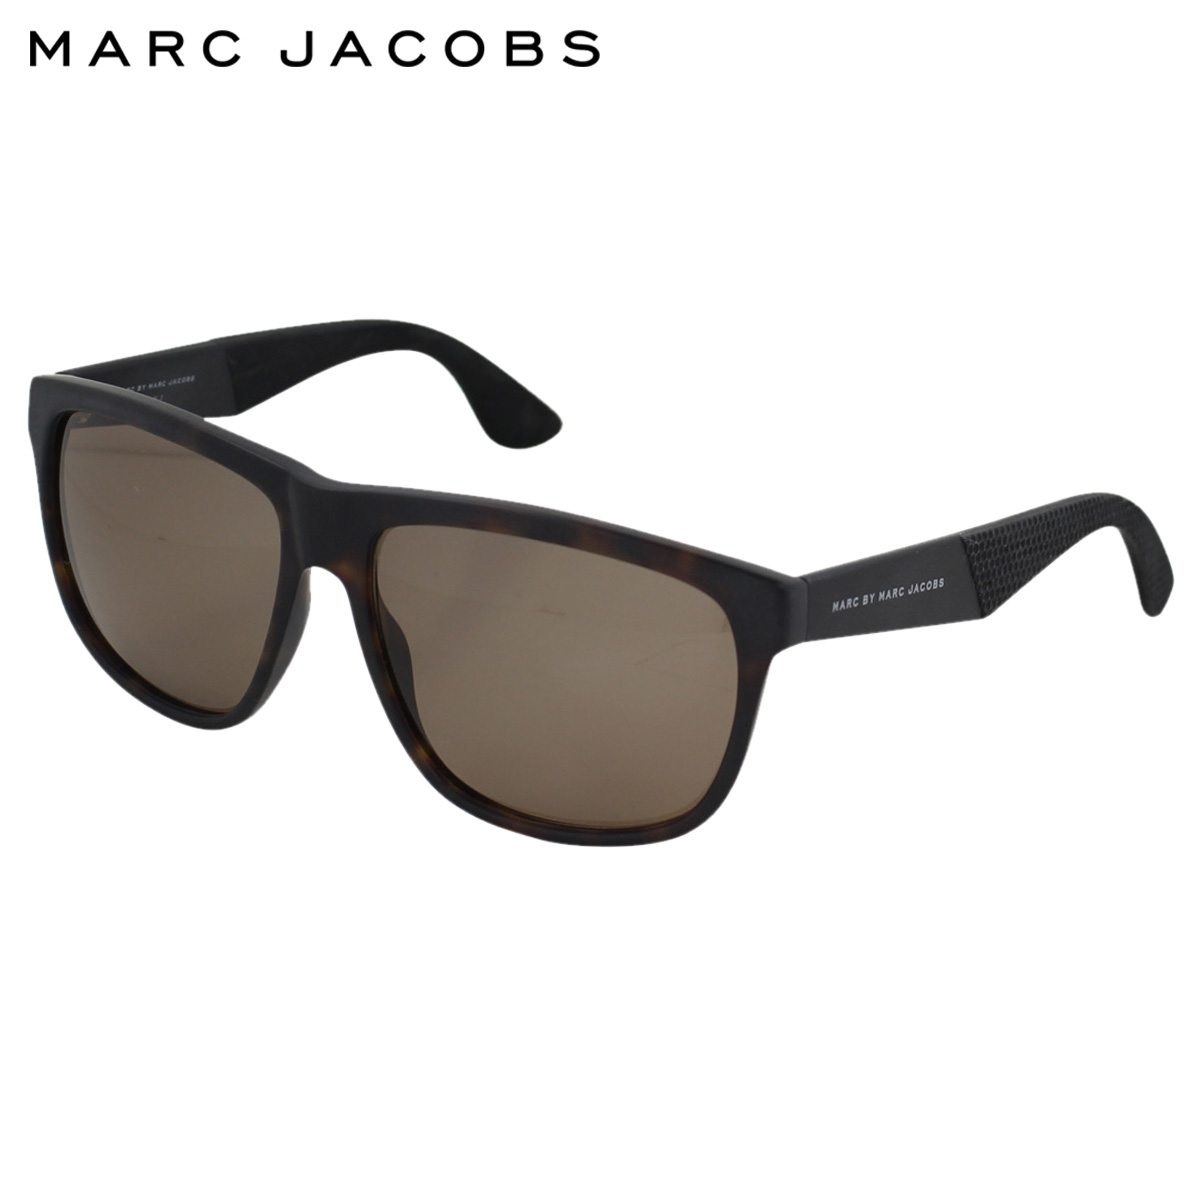 3fa703236dec Whats up Sports: MARC BY MARC JACOBS Marc by Marc Jacobs sunglasses dark  Havana men women | Rakuten Global Market